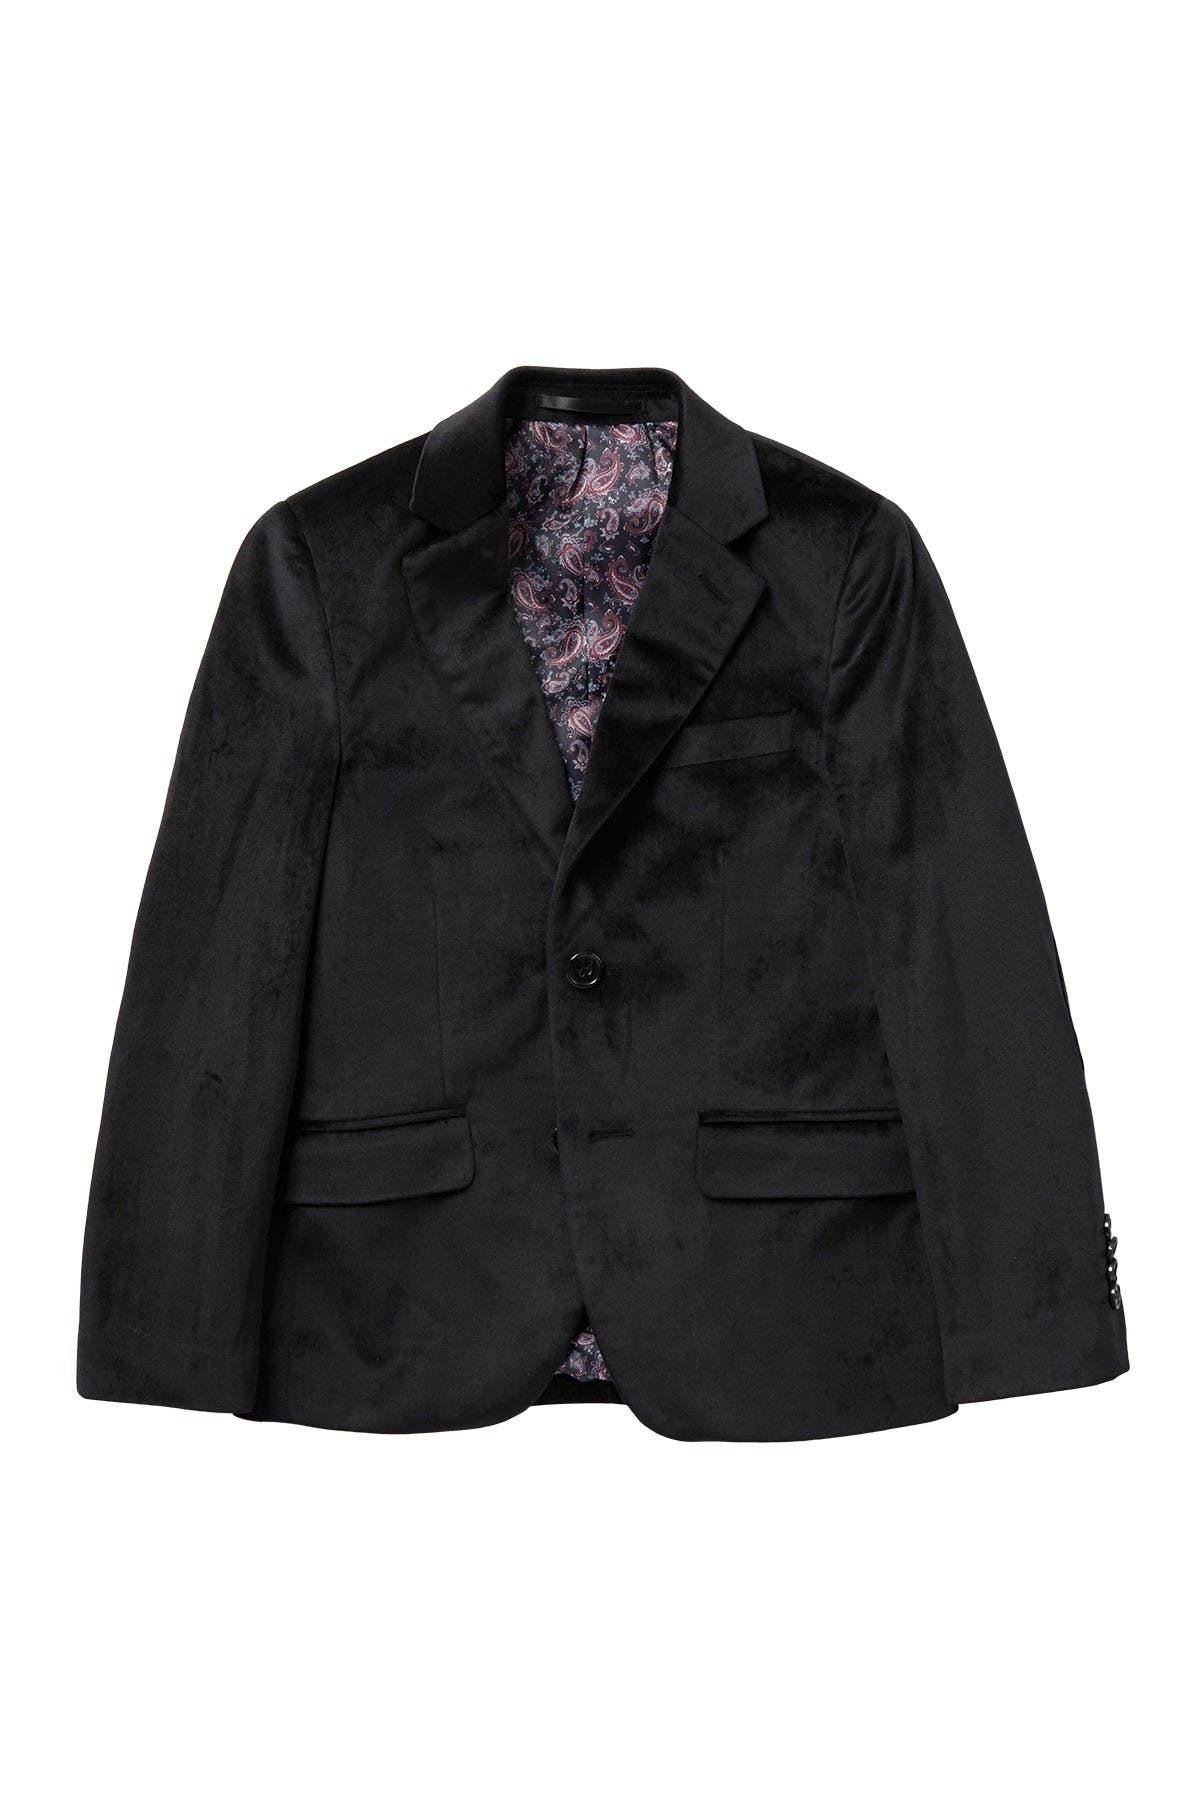 Image of Isaac Mizrahi Classic Two-Button Velvet Blazer